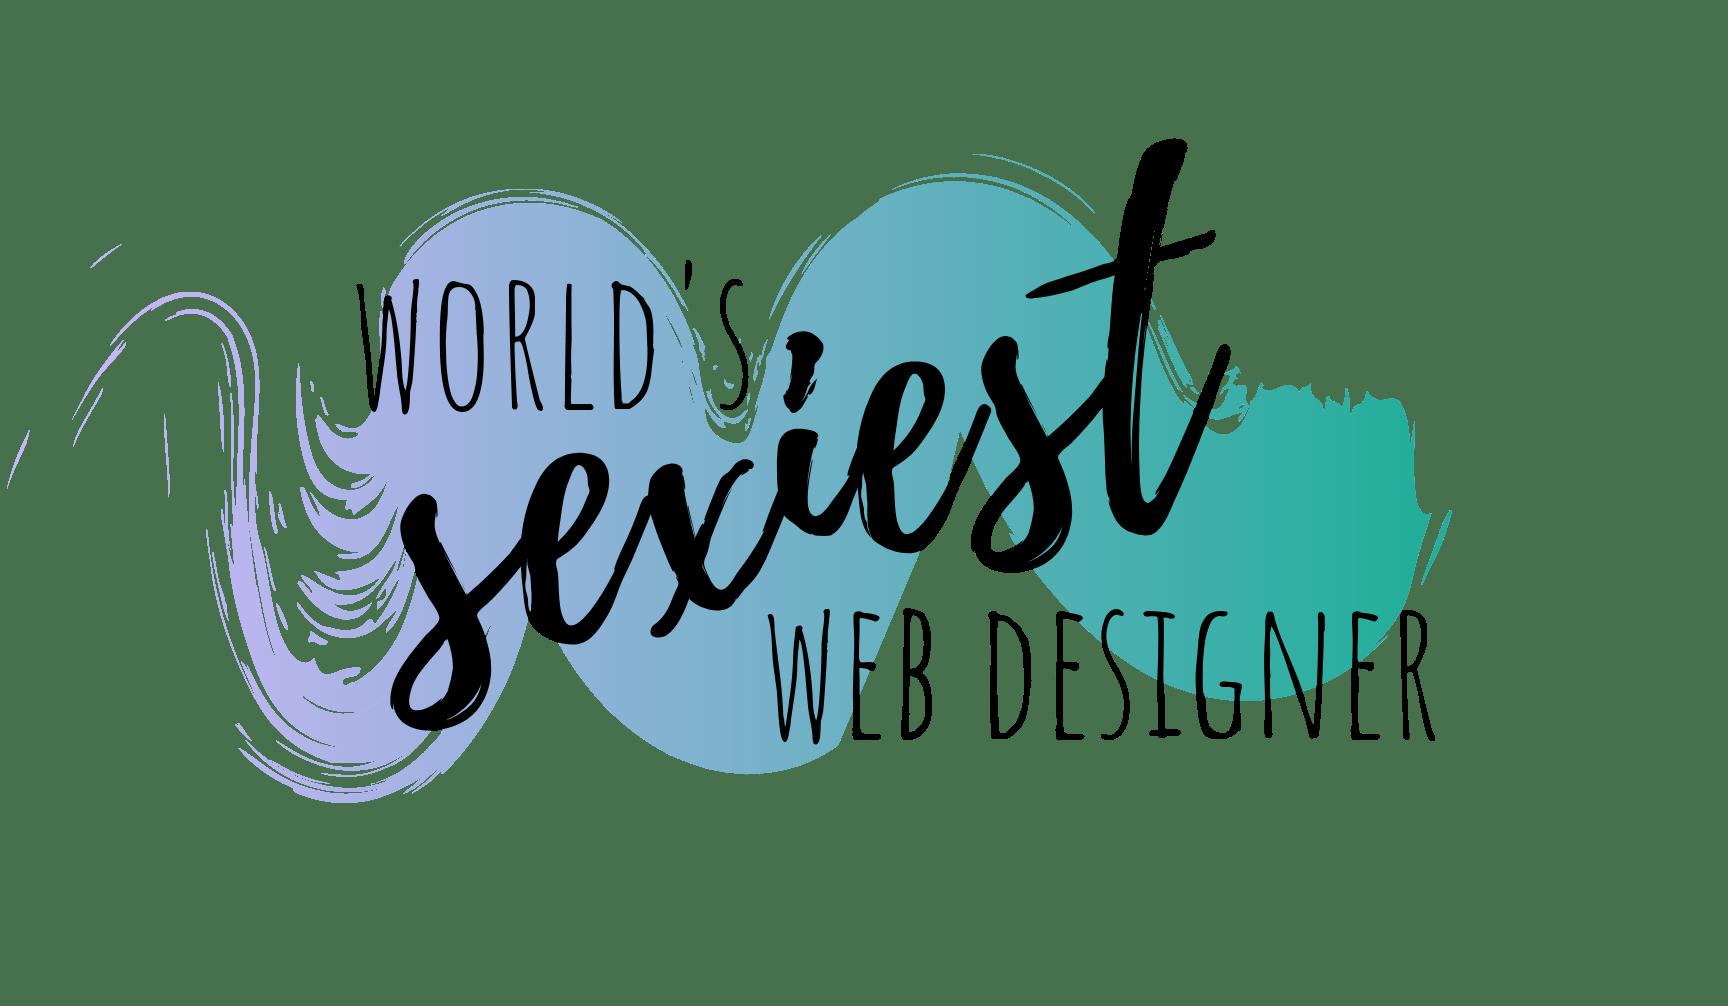 Design World's sexiest web designer